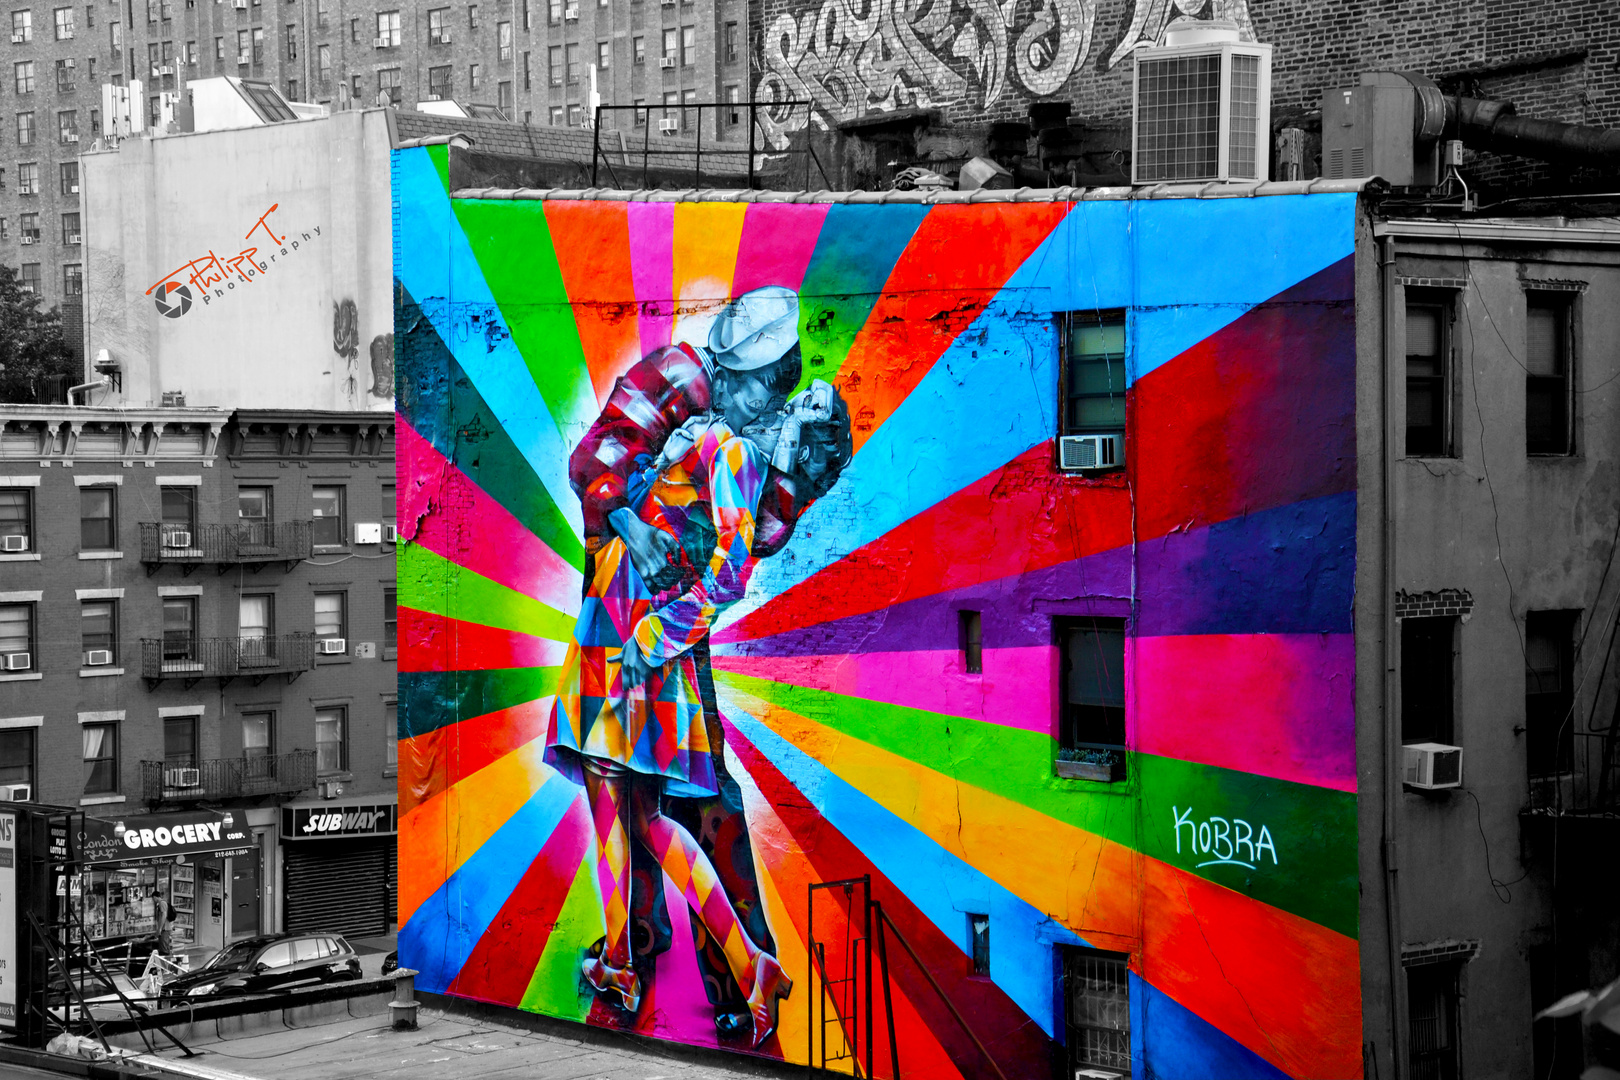 Streetart New York by Kobra